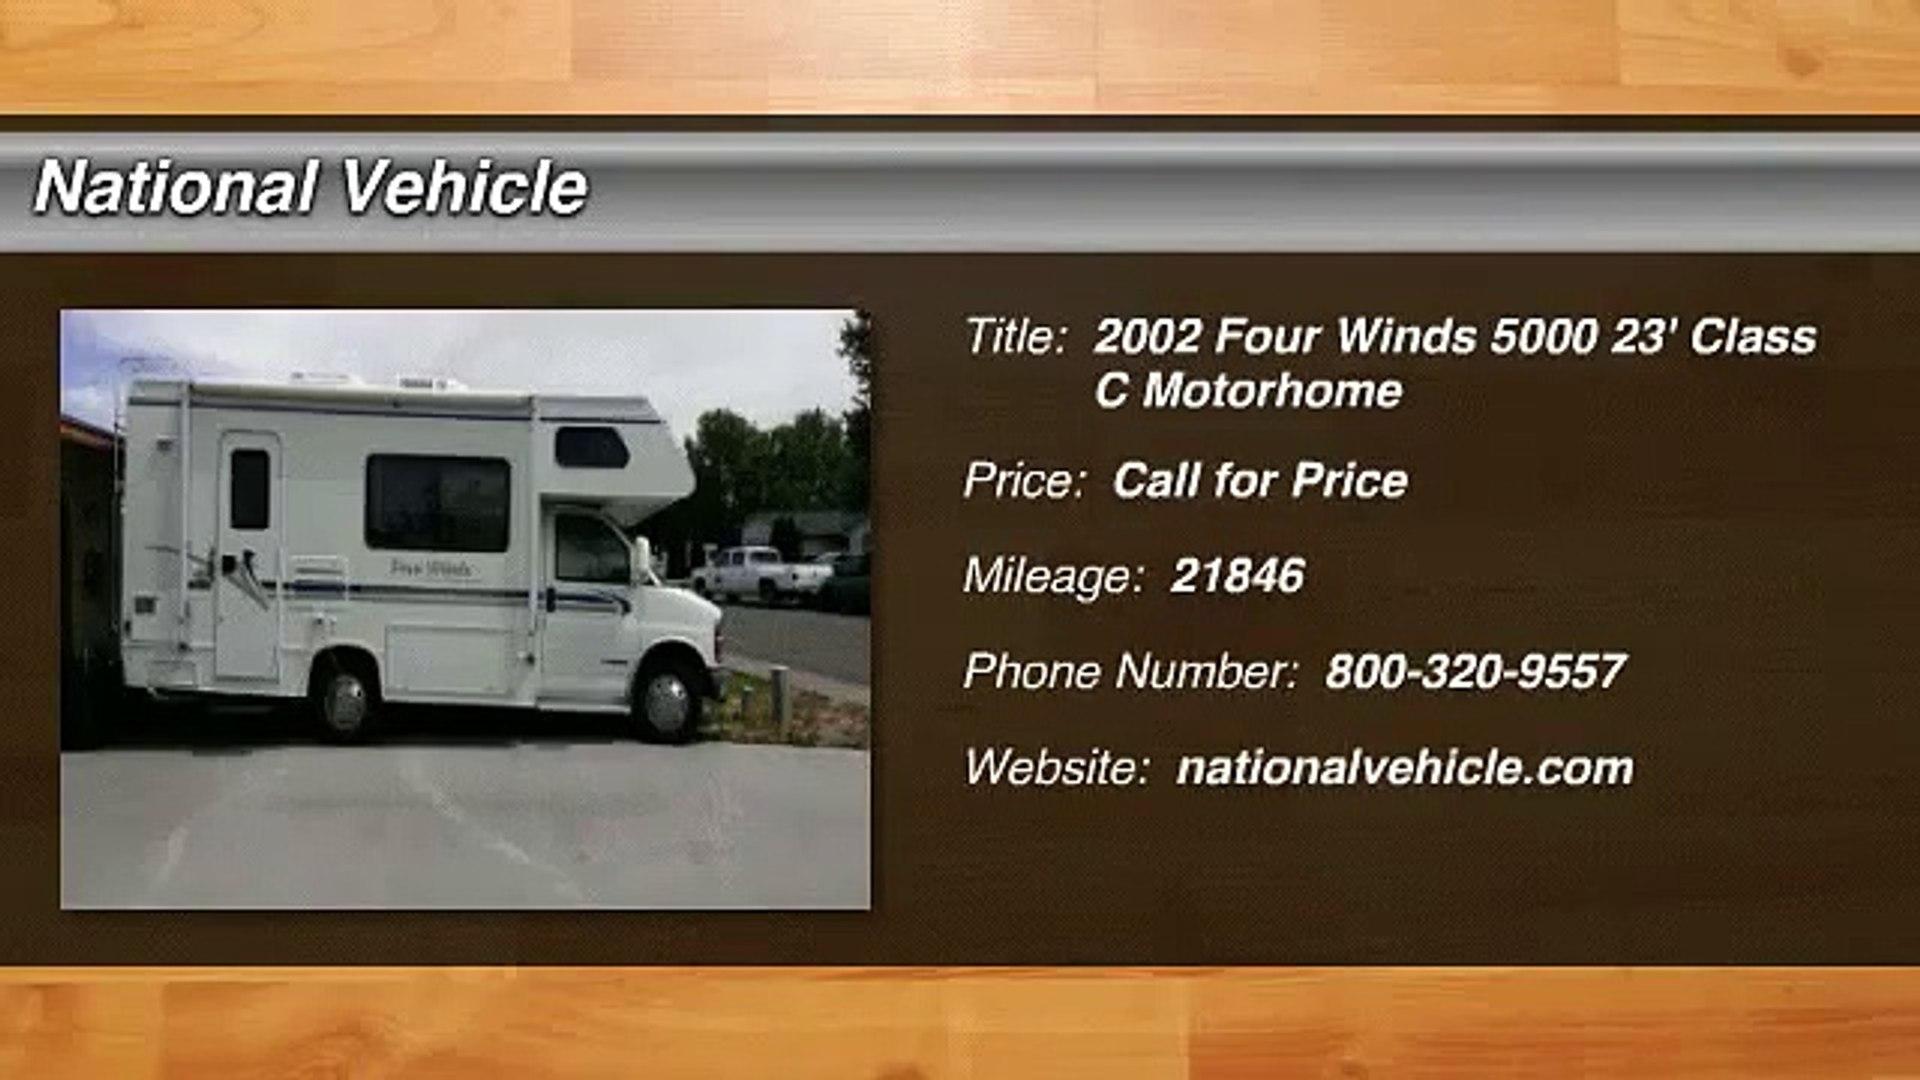 2002 Four Winds 5000 23' Class C Motorhome c544120